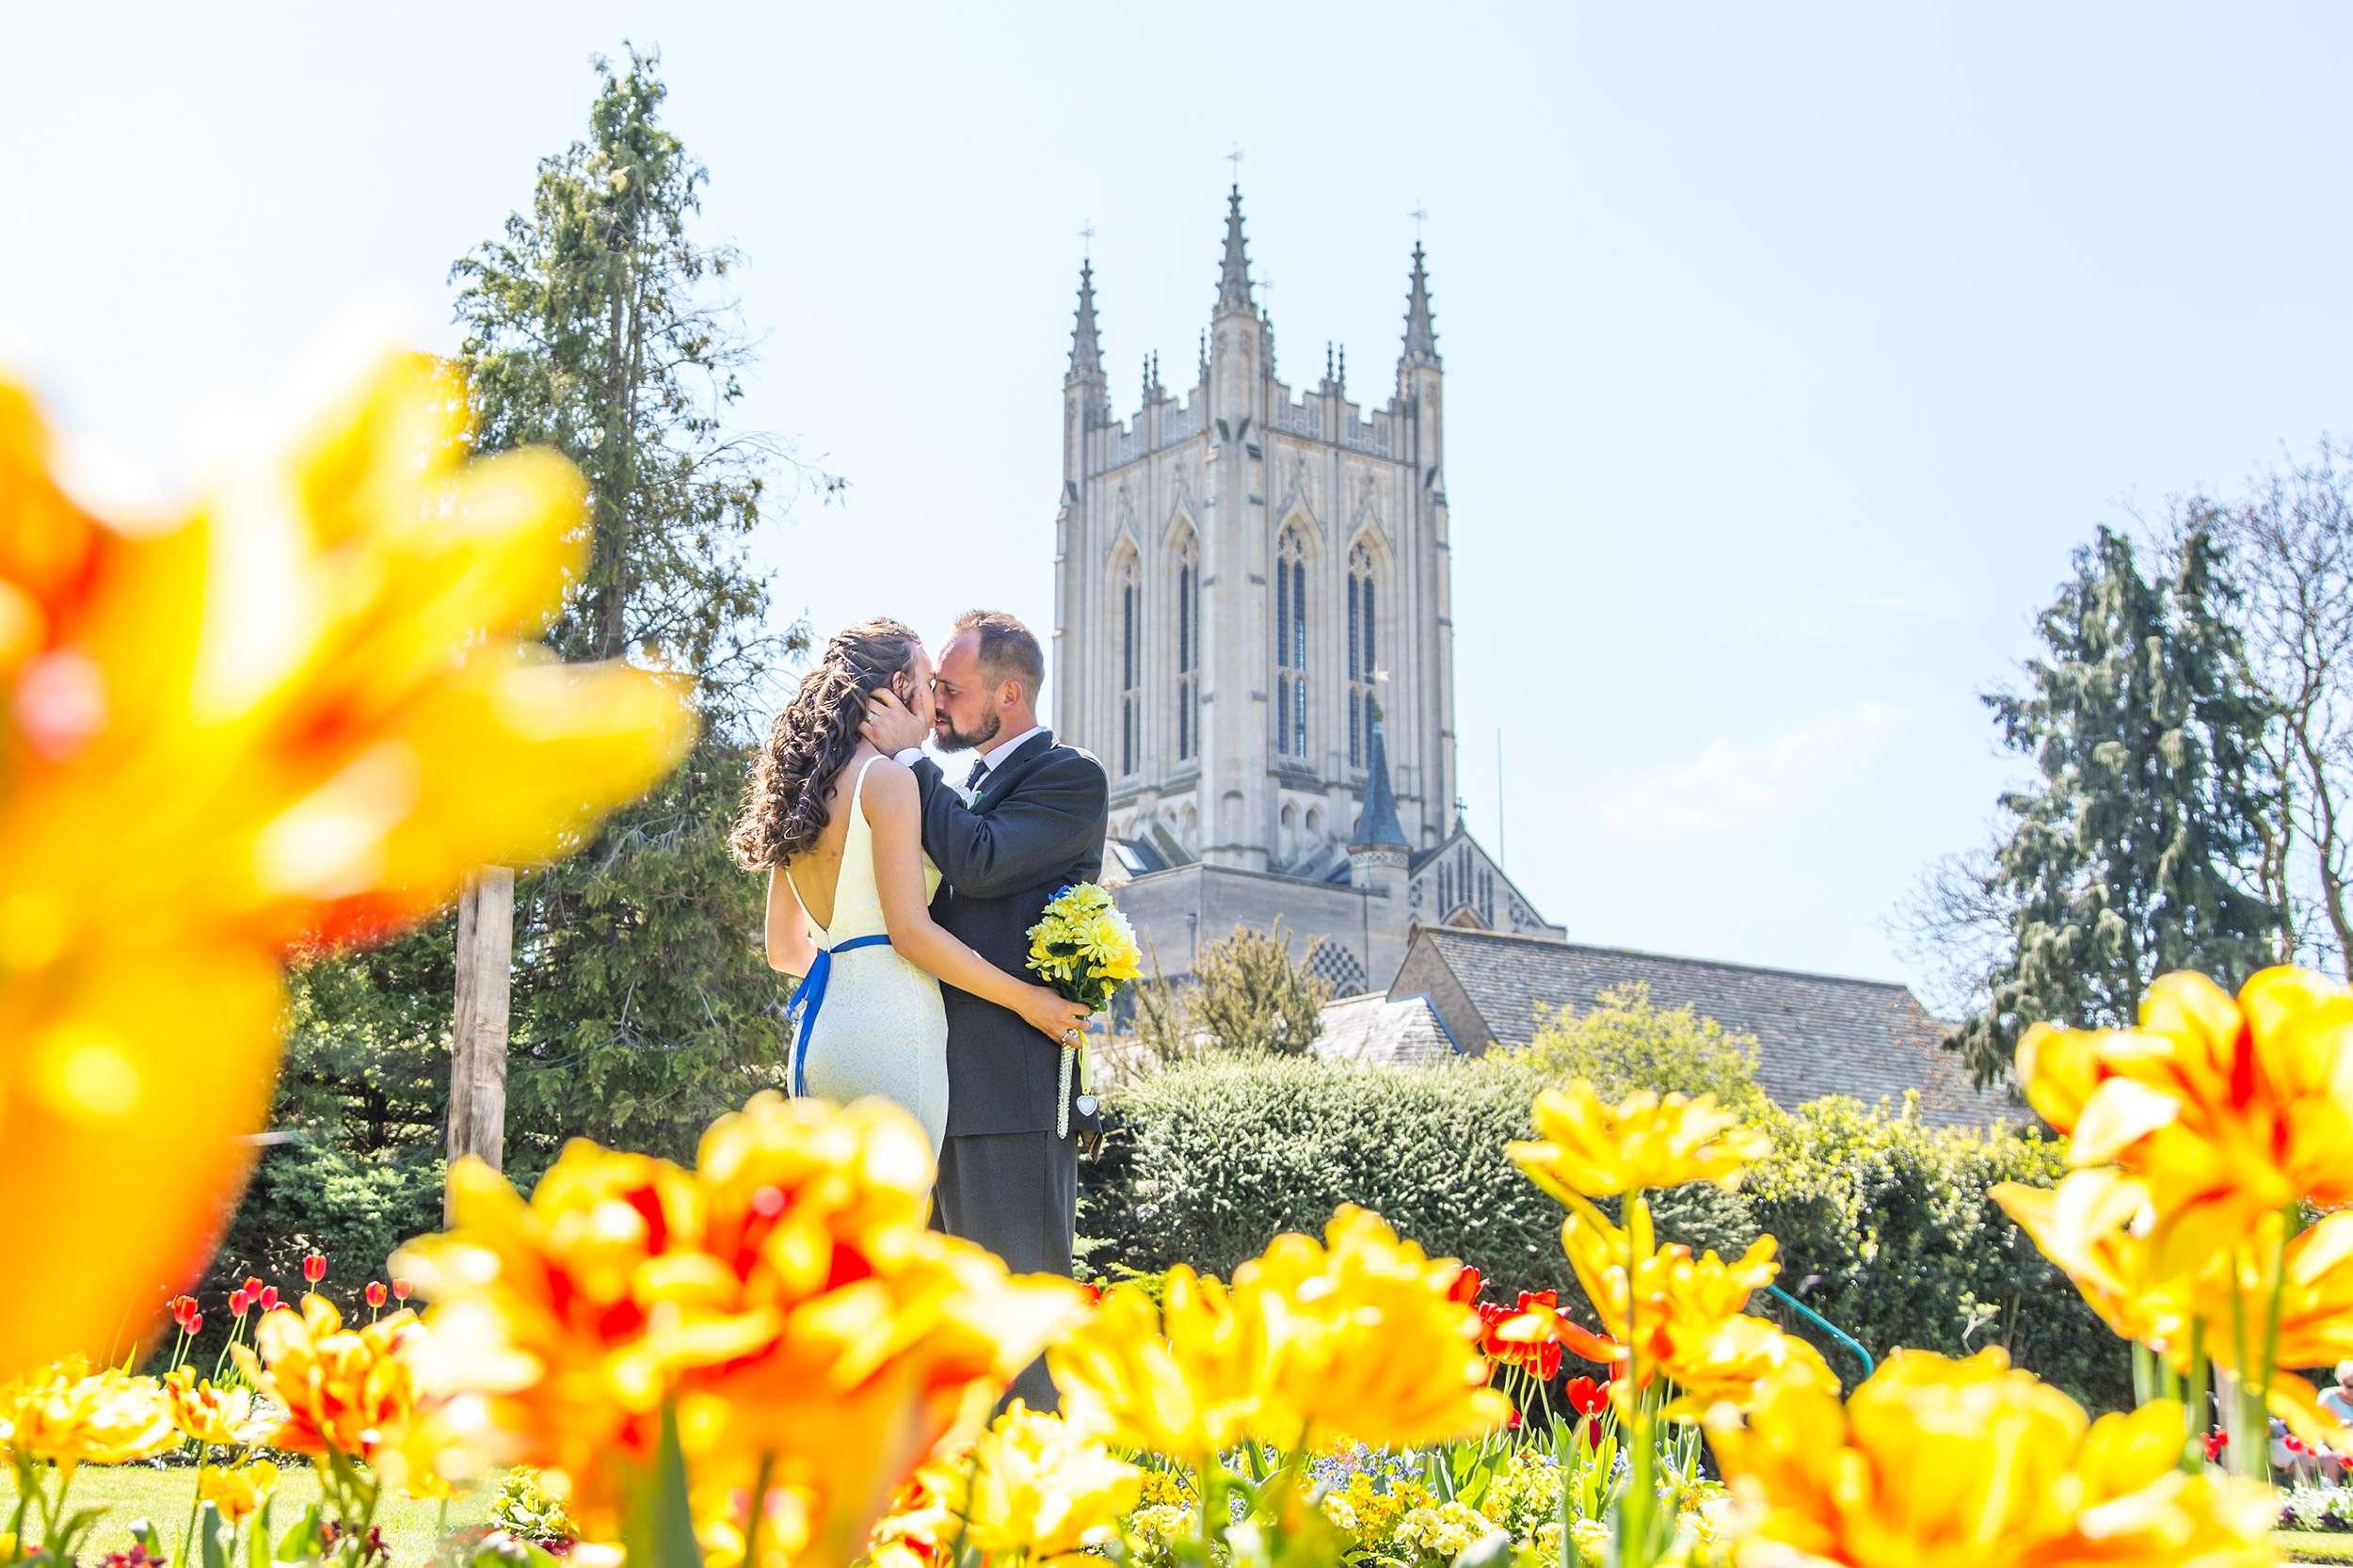 Bride & Groom kissing in Abbey Gardens in Bury St Edmunds in Suffolk